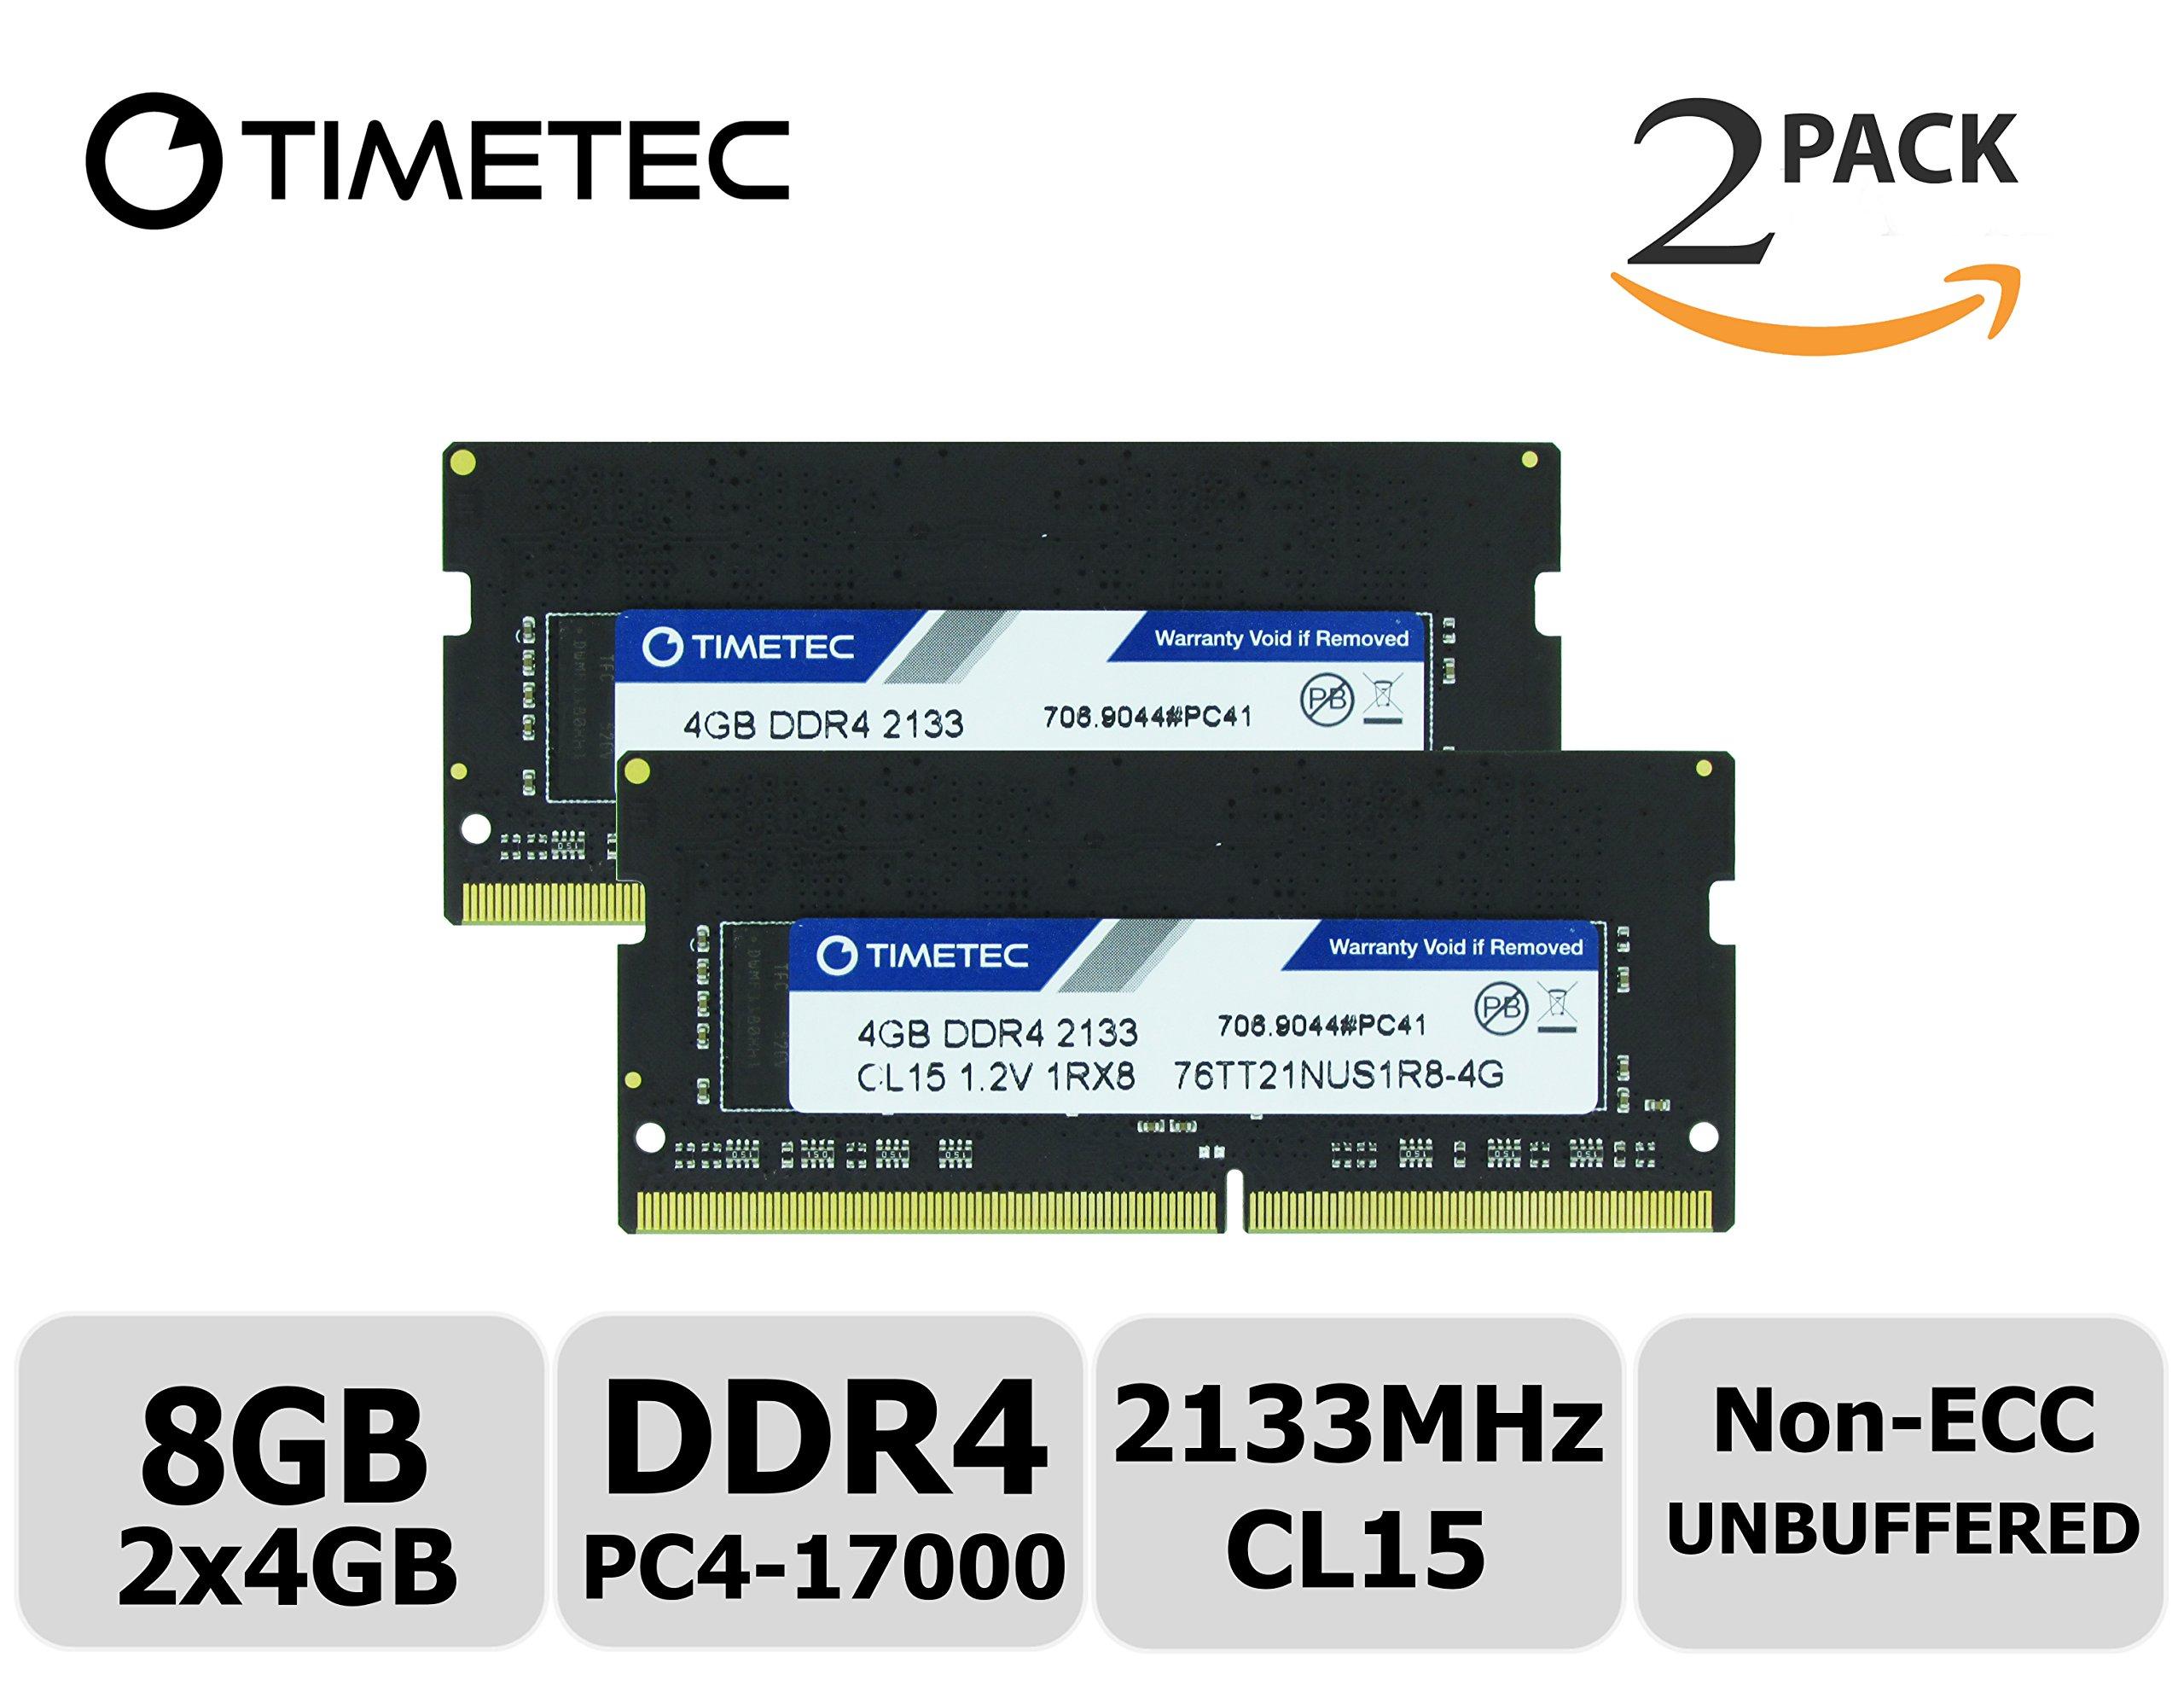 Timetec Hynix IC 8GB KIT (2x4GB) DDR4 2133MHz PC4-17000 Non ECC Unbuffered 1.2V CL15 1Rx8 Single Rank 260 Pin SODIMM Laptop Notebook Computer Memory Ram Module Upgrade (8GB KIT (2x4GB))